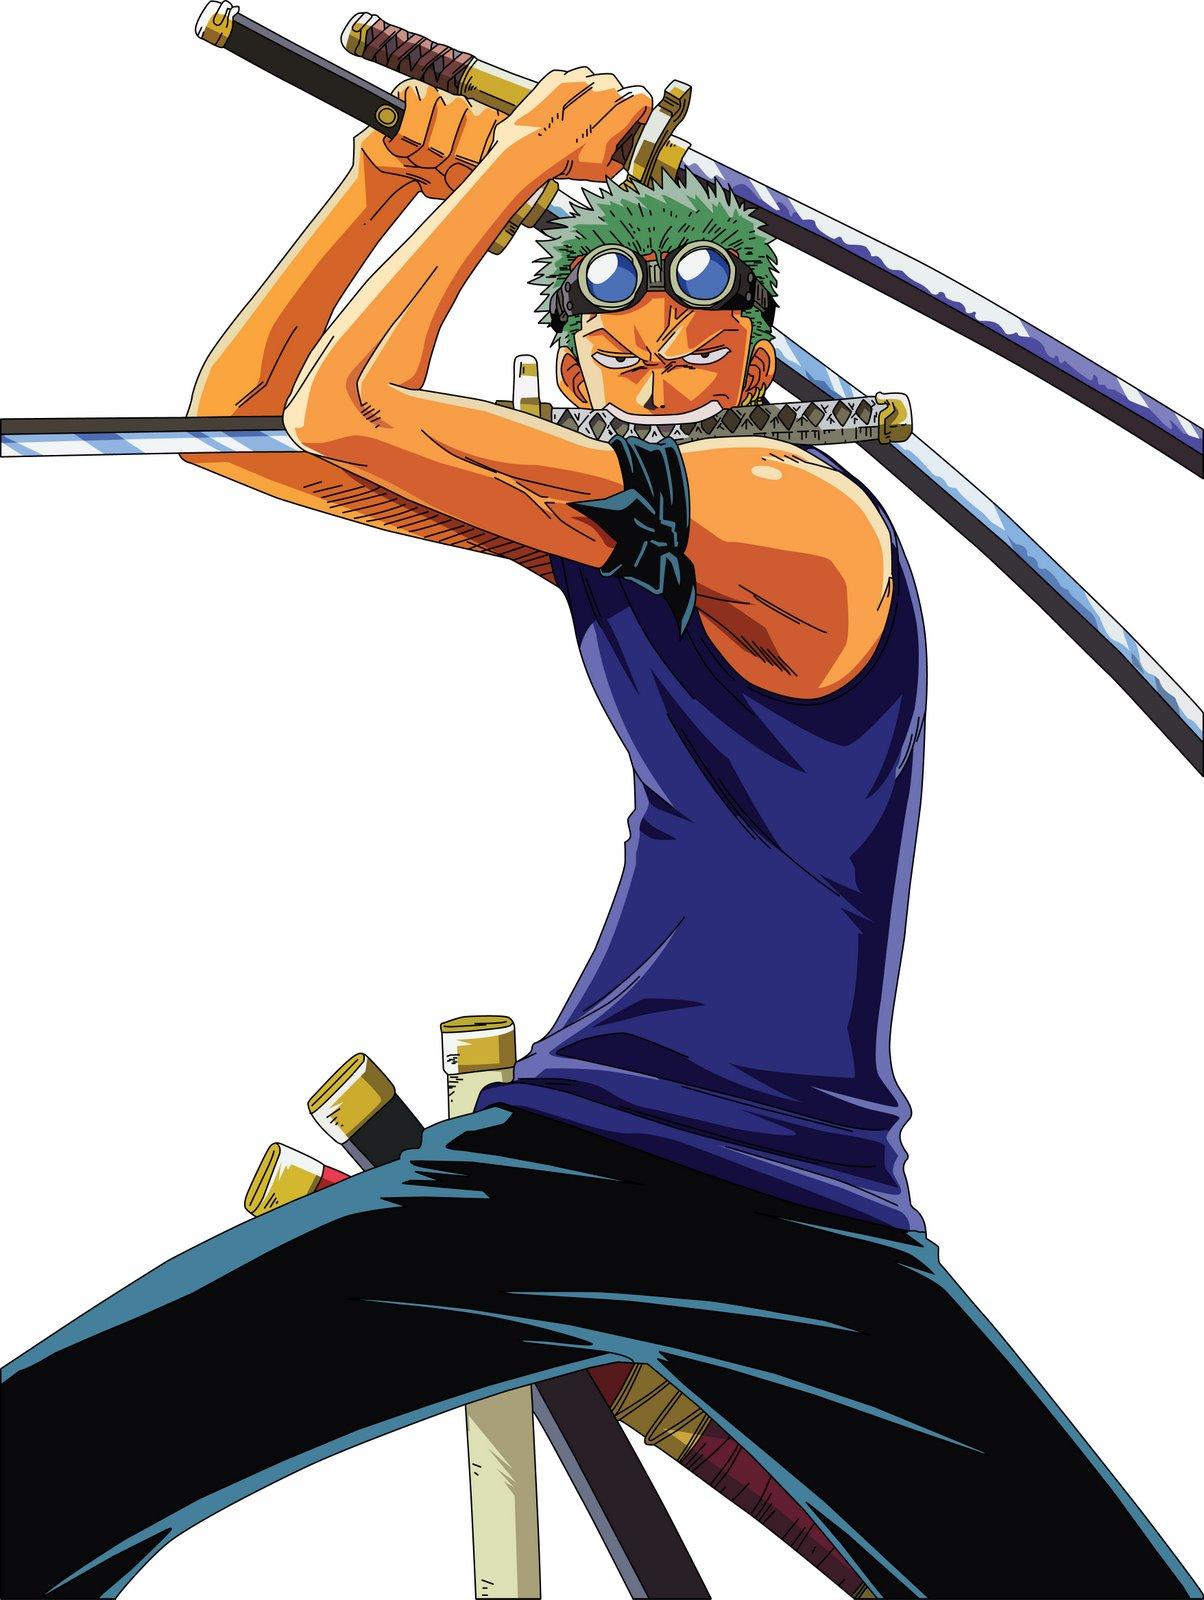 Roronoa Zoro - ONE PIECE - Image #25651 - Zerochan Anime Image Board